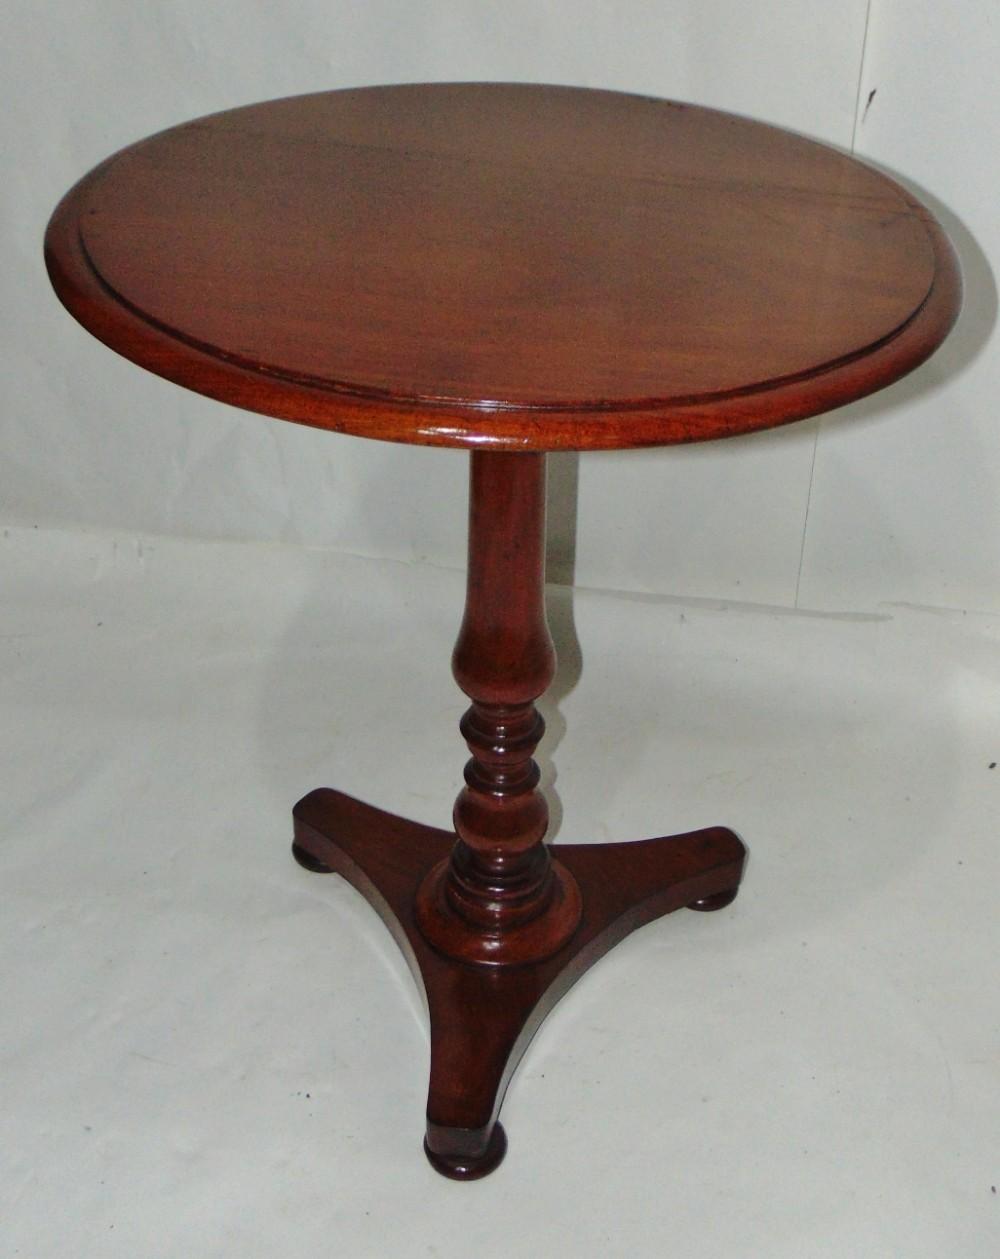 regency mahogany pedestal table circa 1830